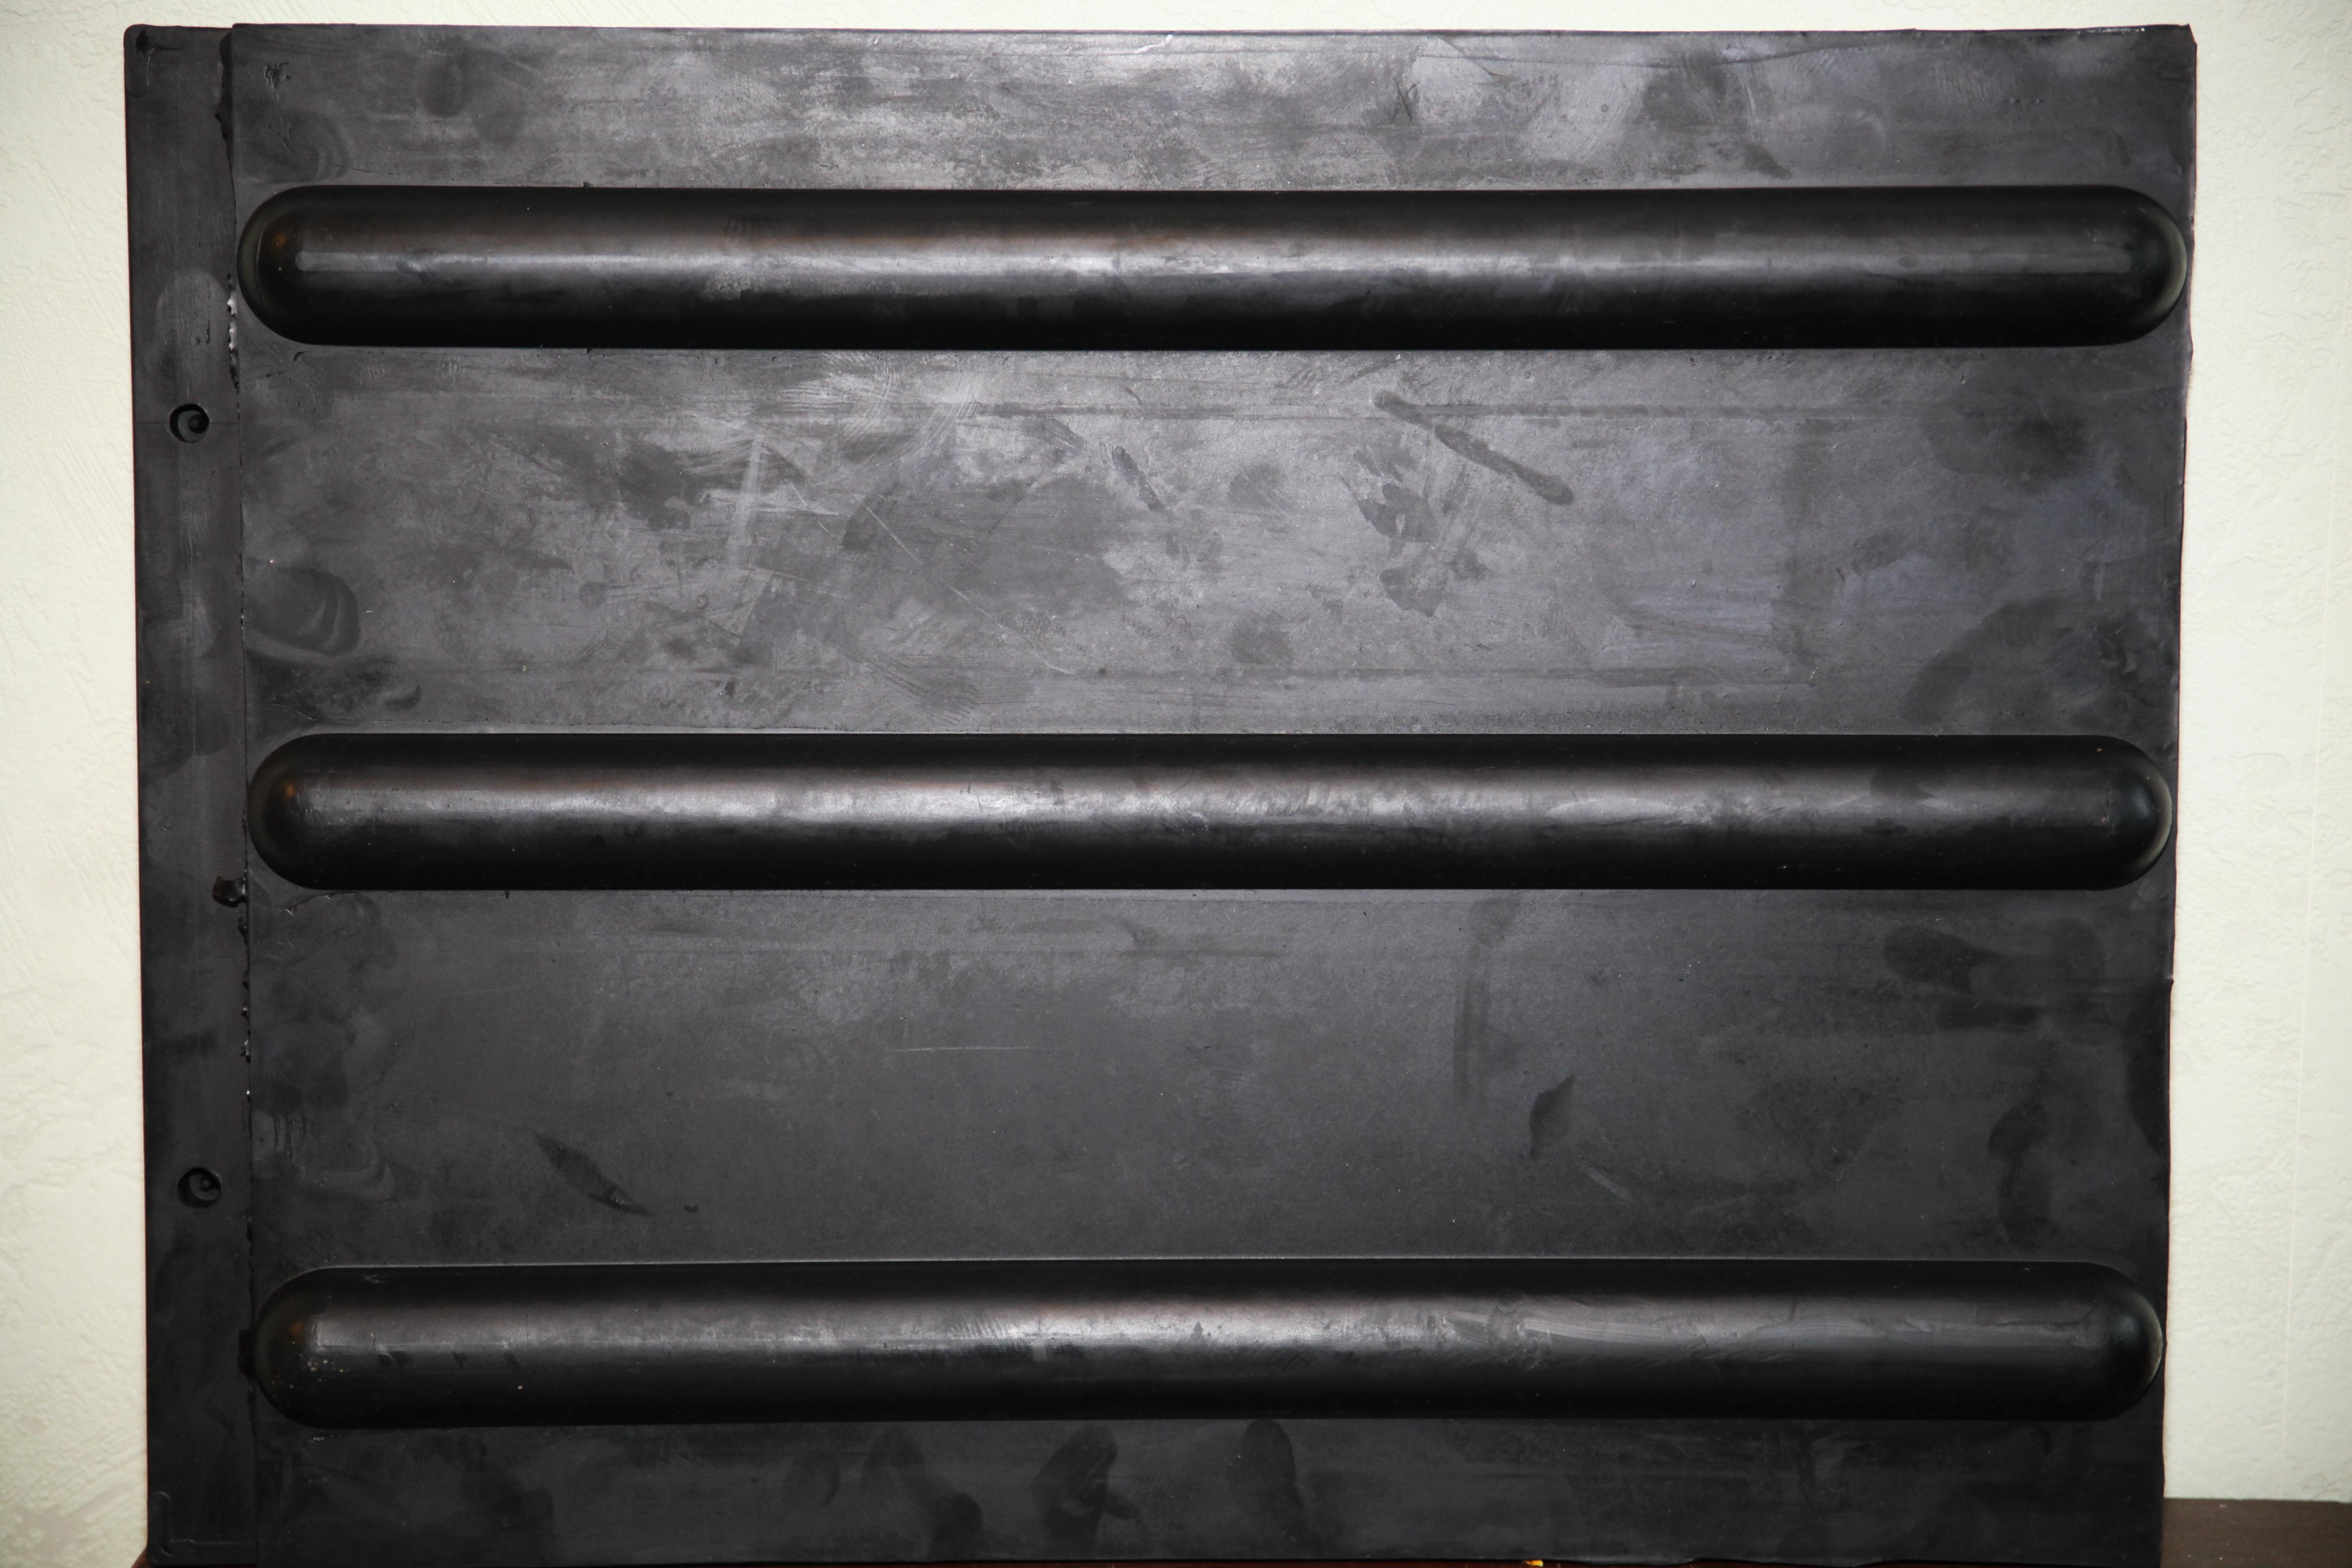 Плита-отбойник для стен (защита) 400х500х20 без светоотражающей пленки